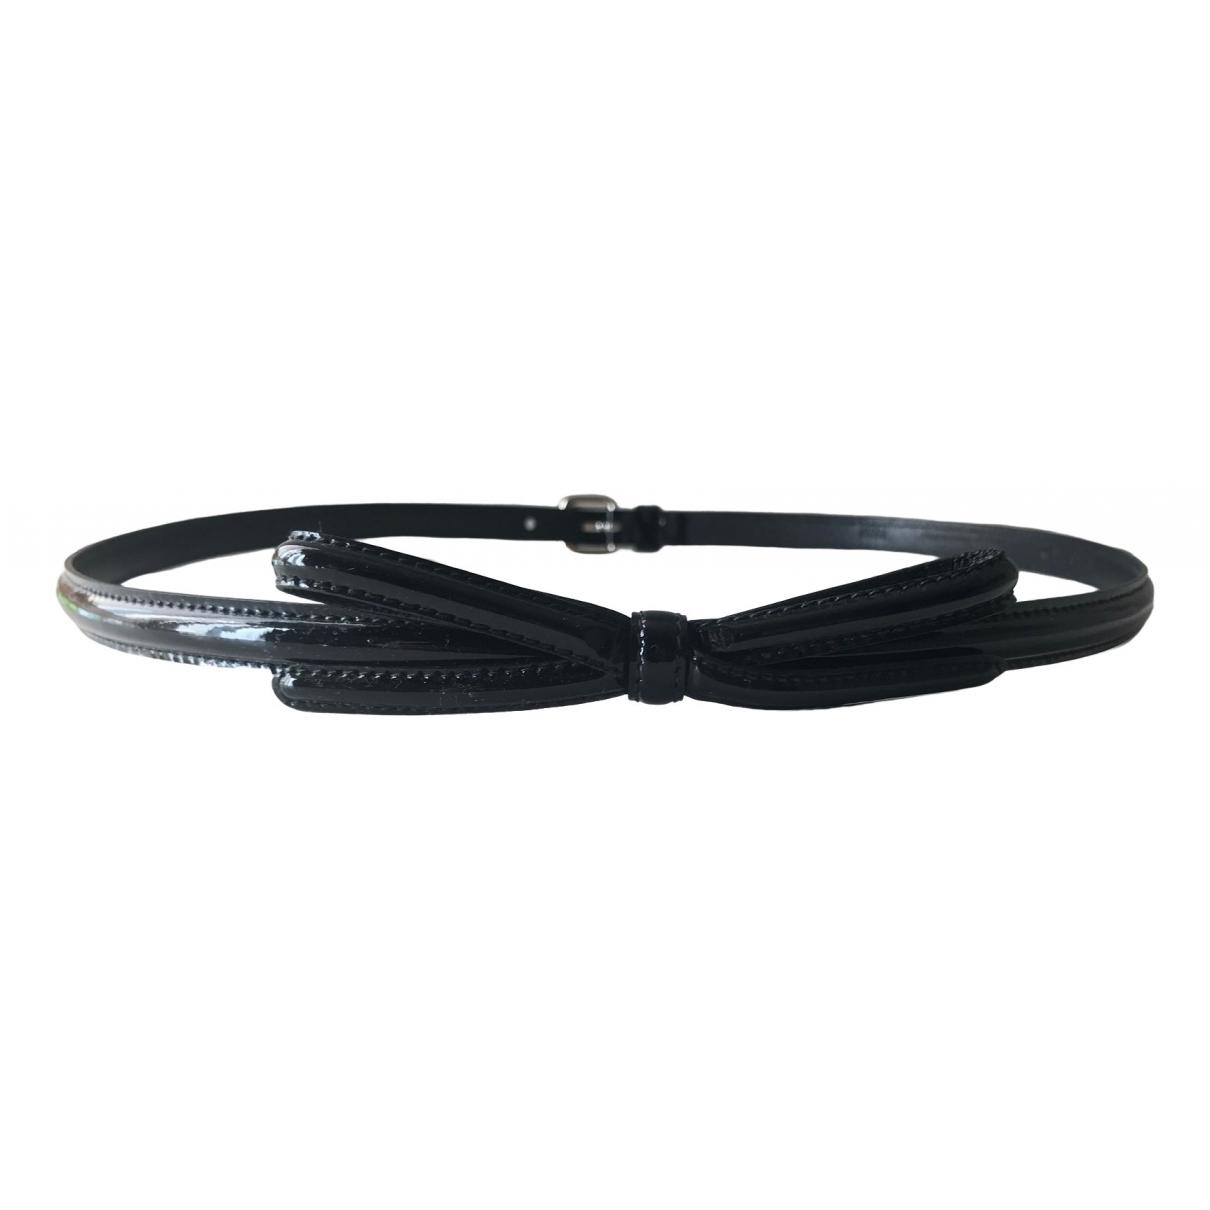 Prada \N Black Patent leather belt for Women 75 cm